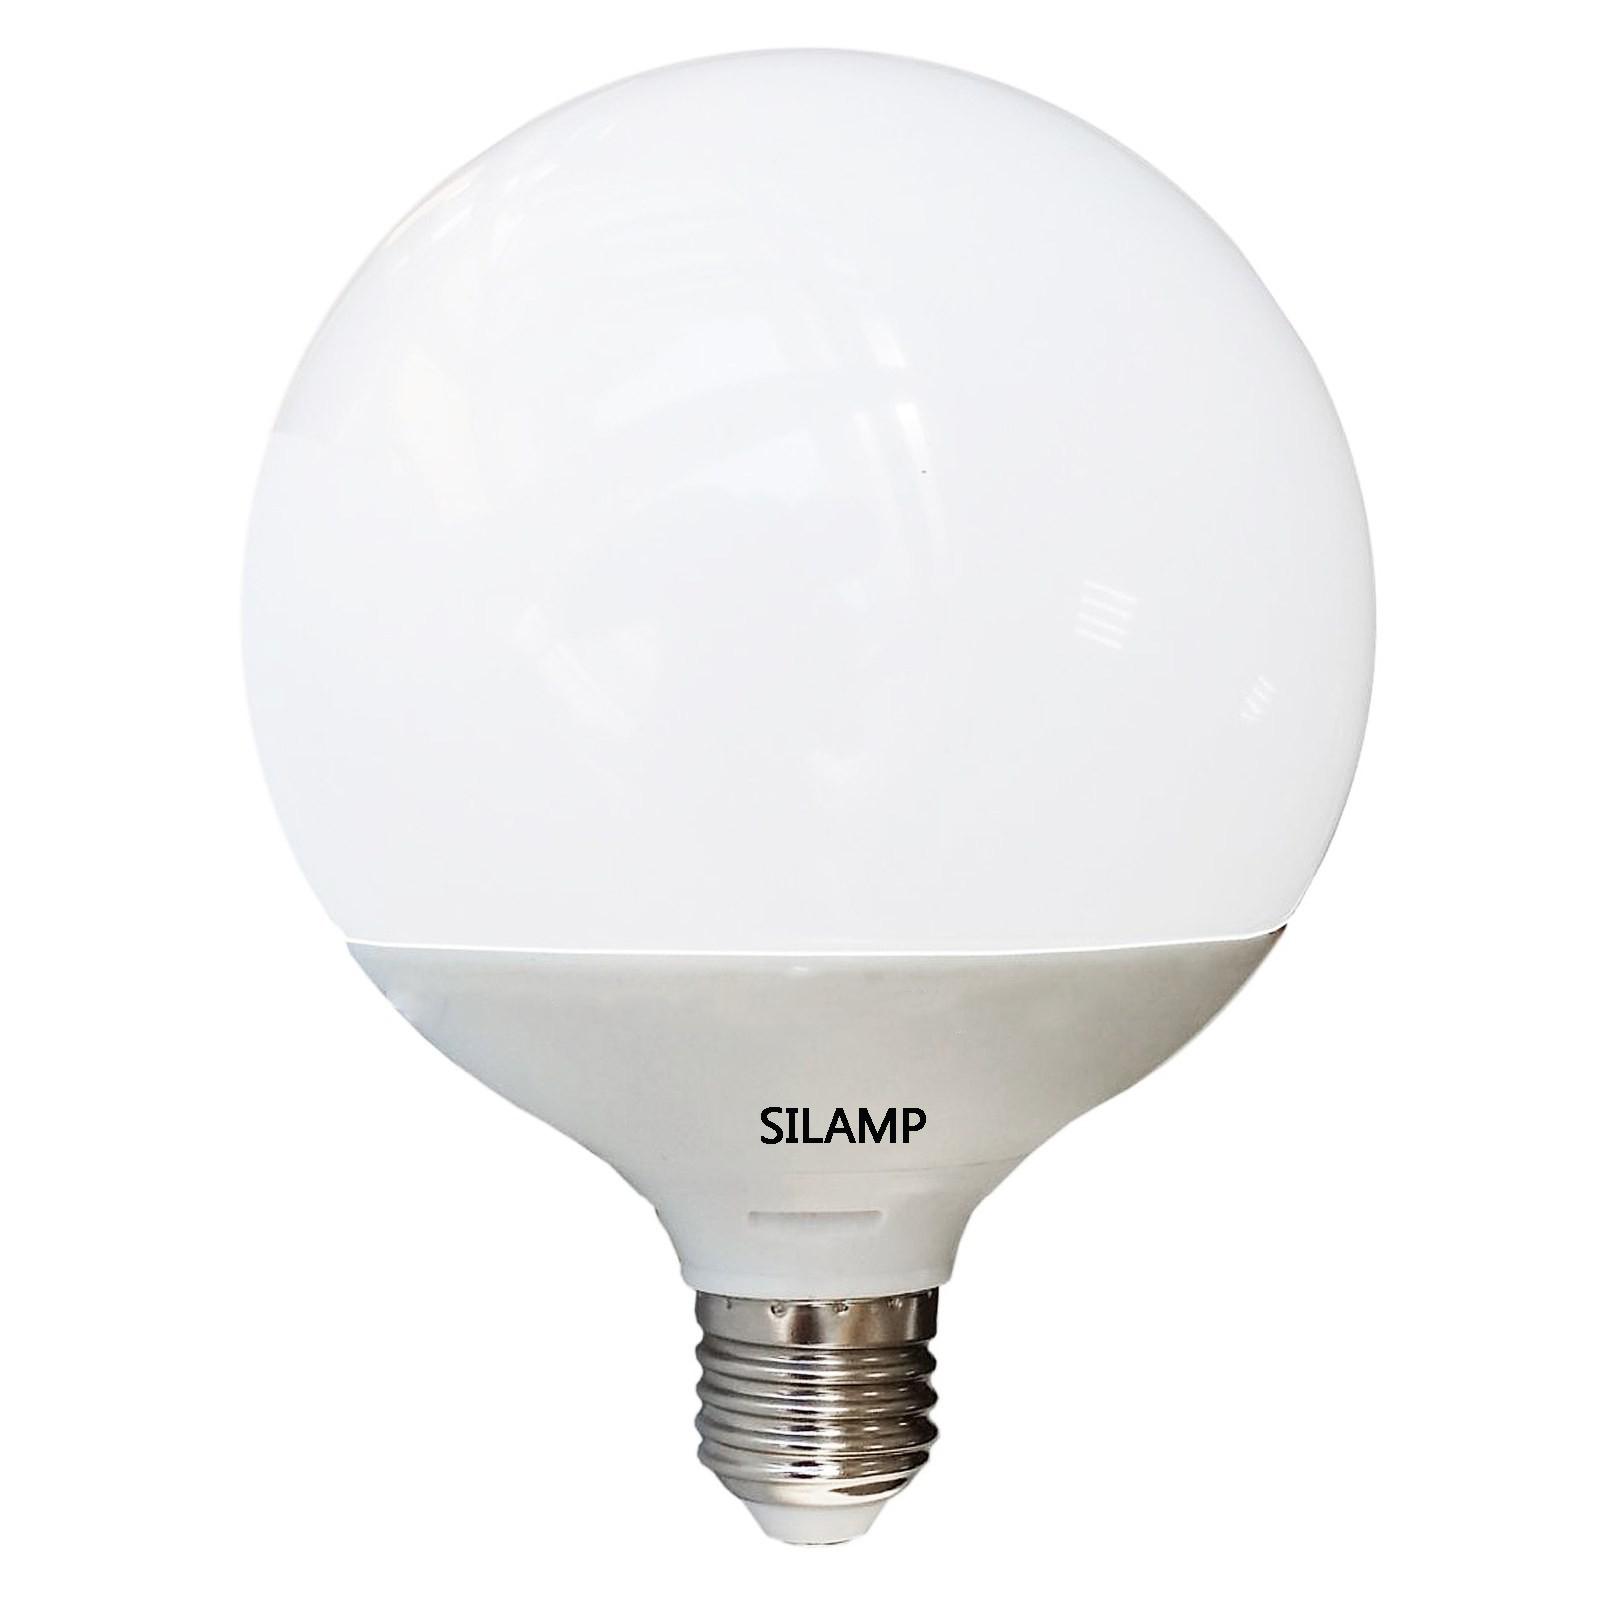 G95 12w offerte lampadine led silamp lampadina a for Offerte lampadine led